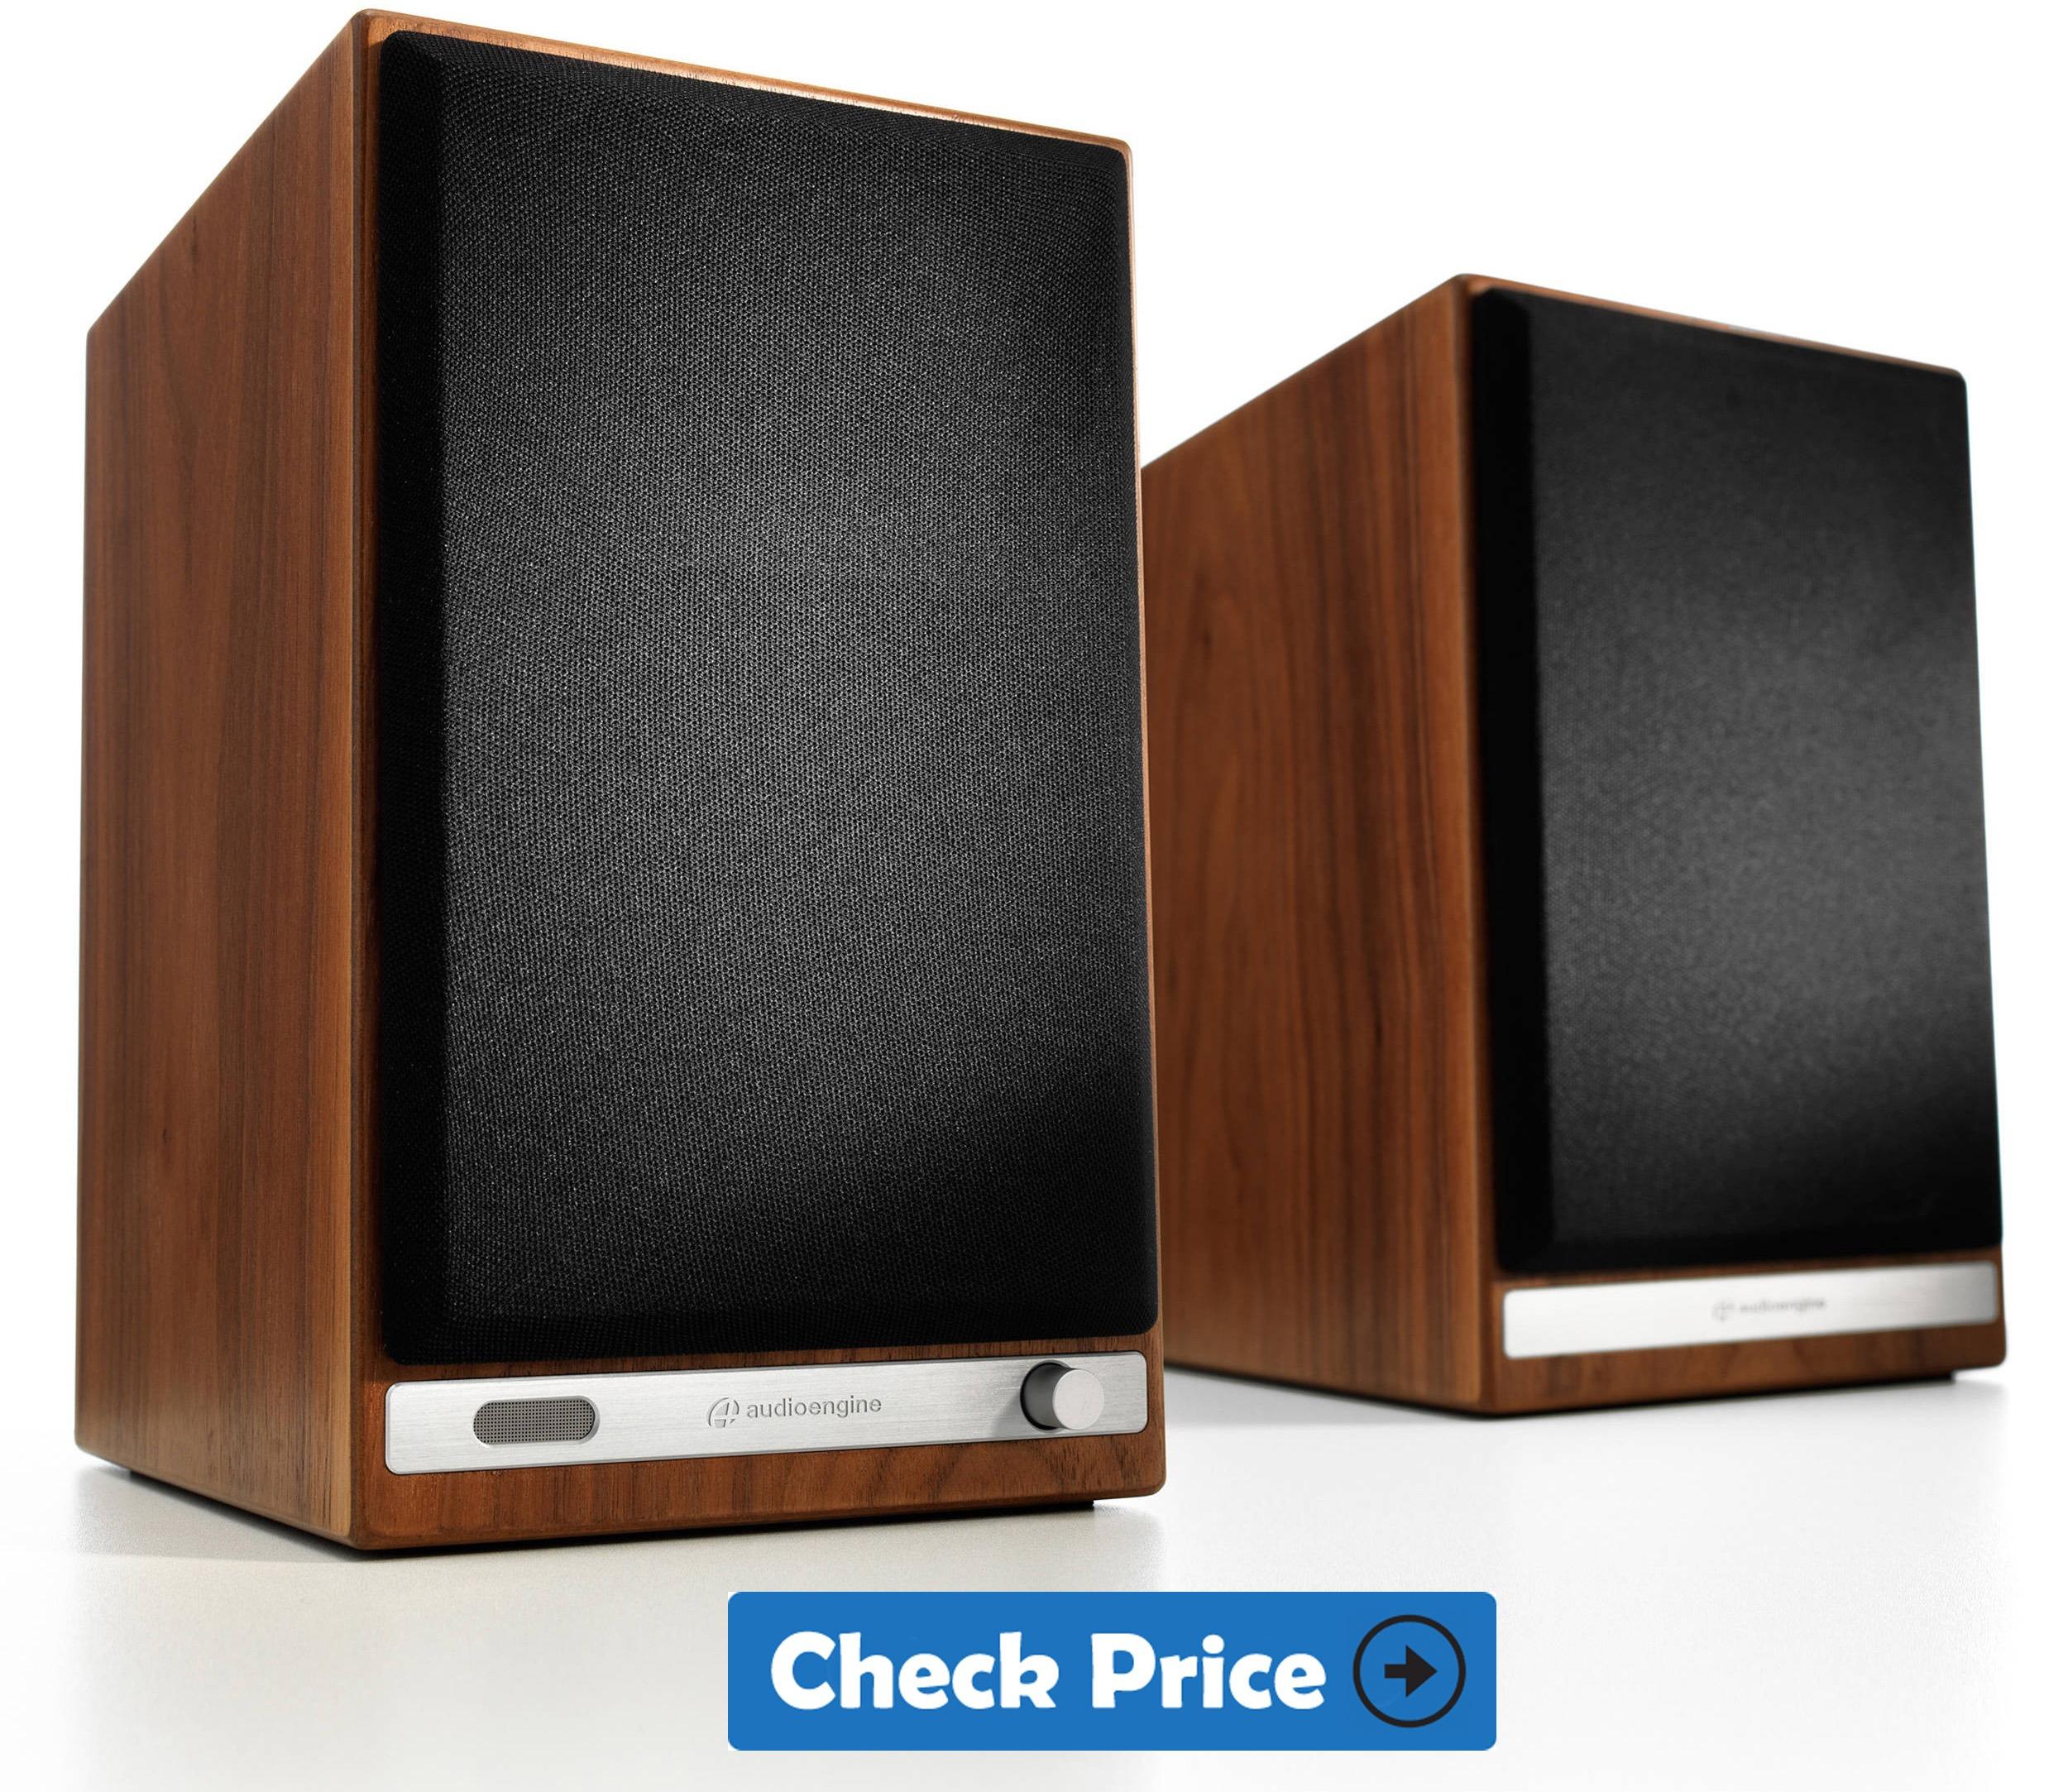 Audioengine HD6 bookshelf speaker under 1000